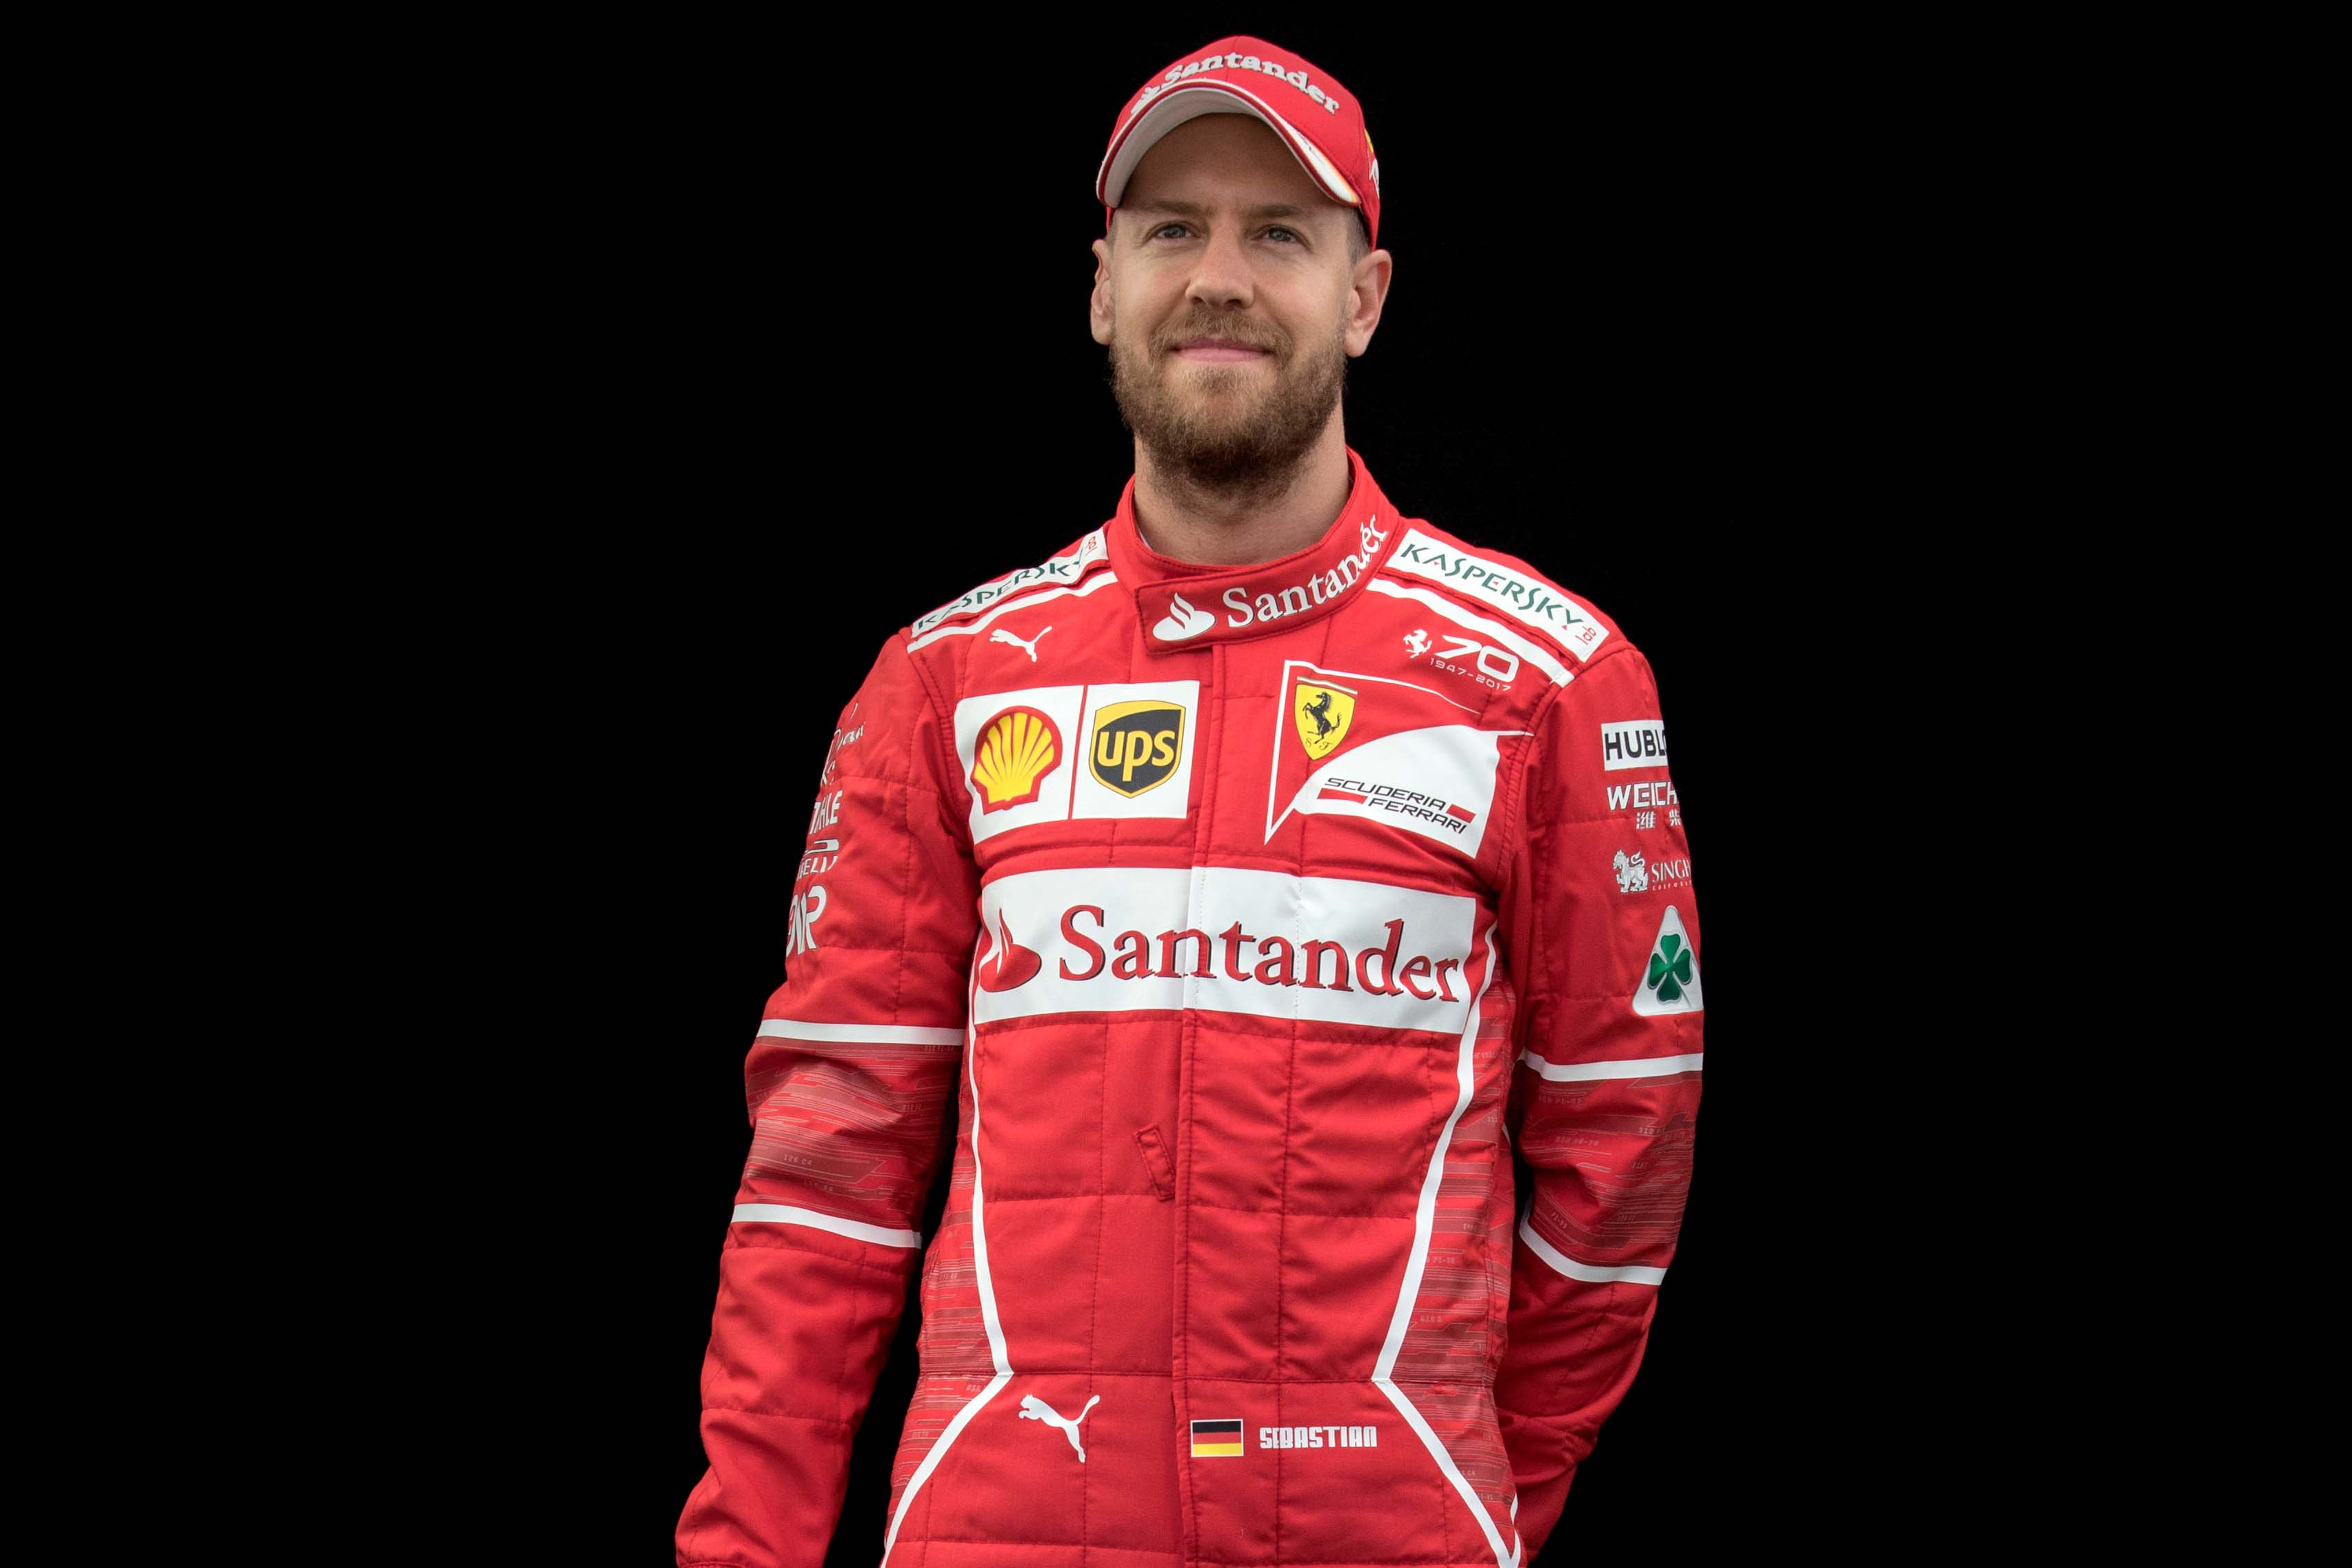 Sebastian Vettel F1i Com HD Style Wallpapers Download free beautiful images and photos HD [prarshipsa.tk]